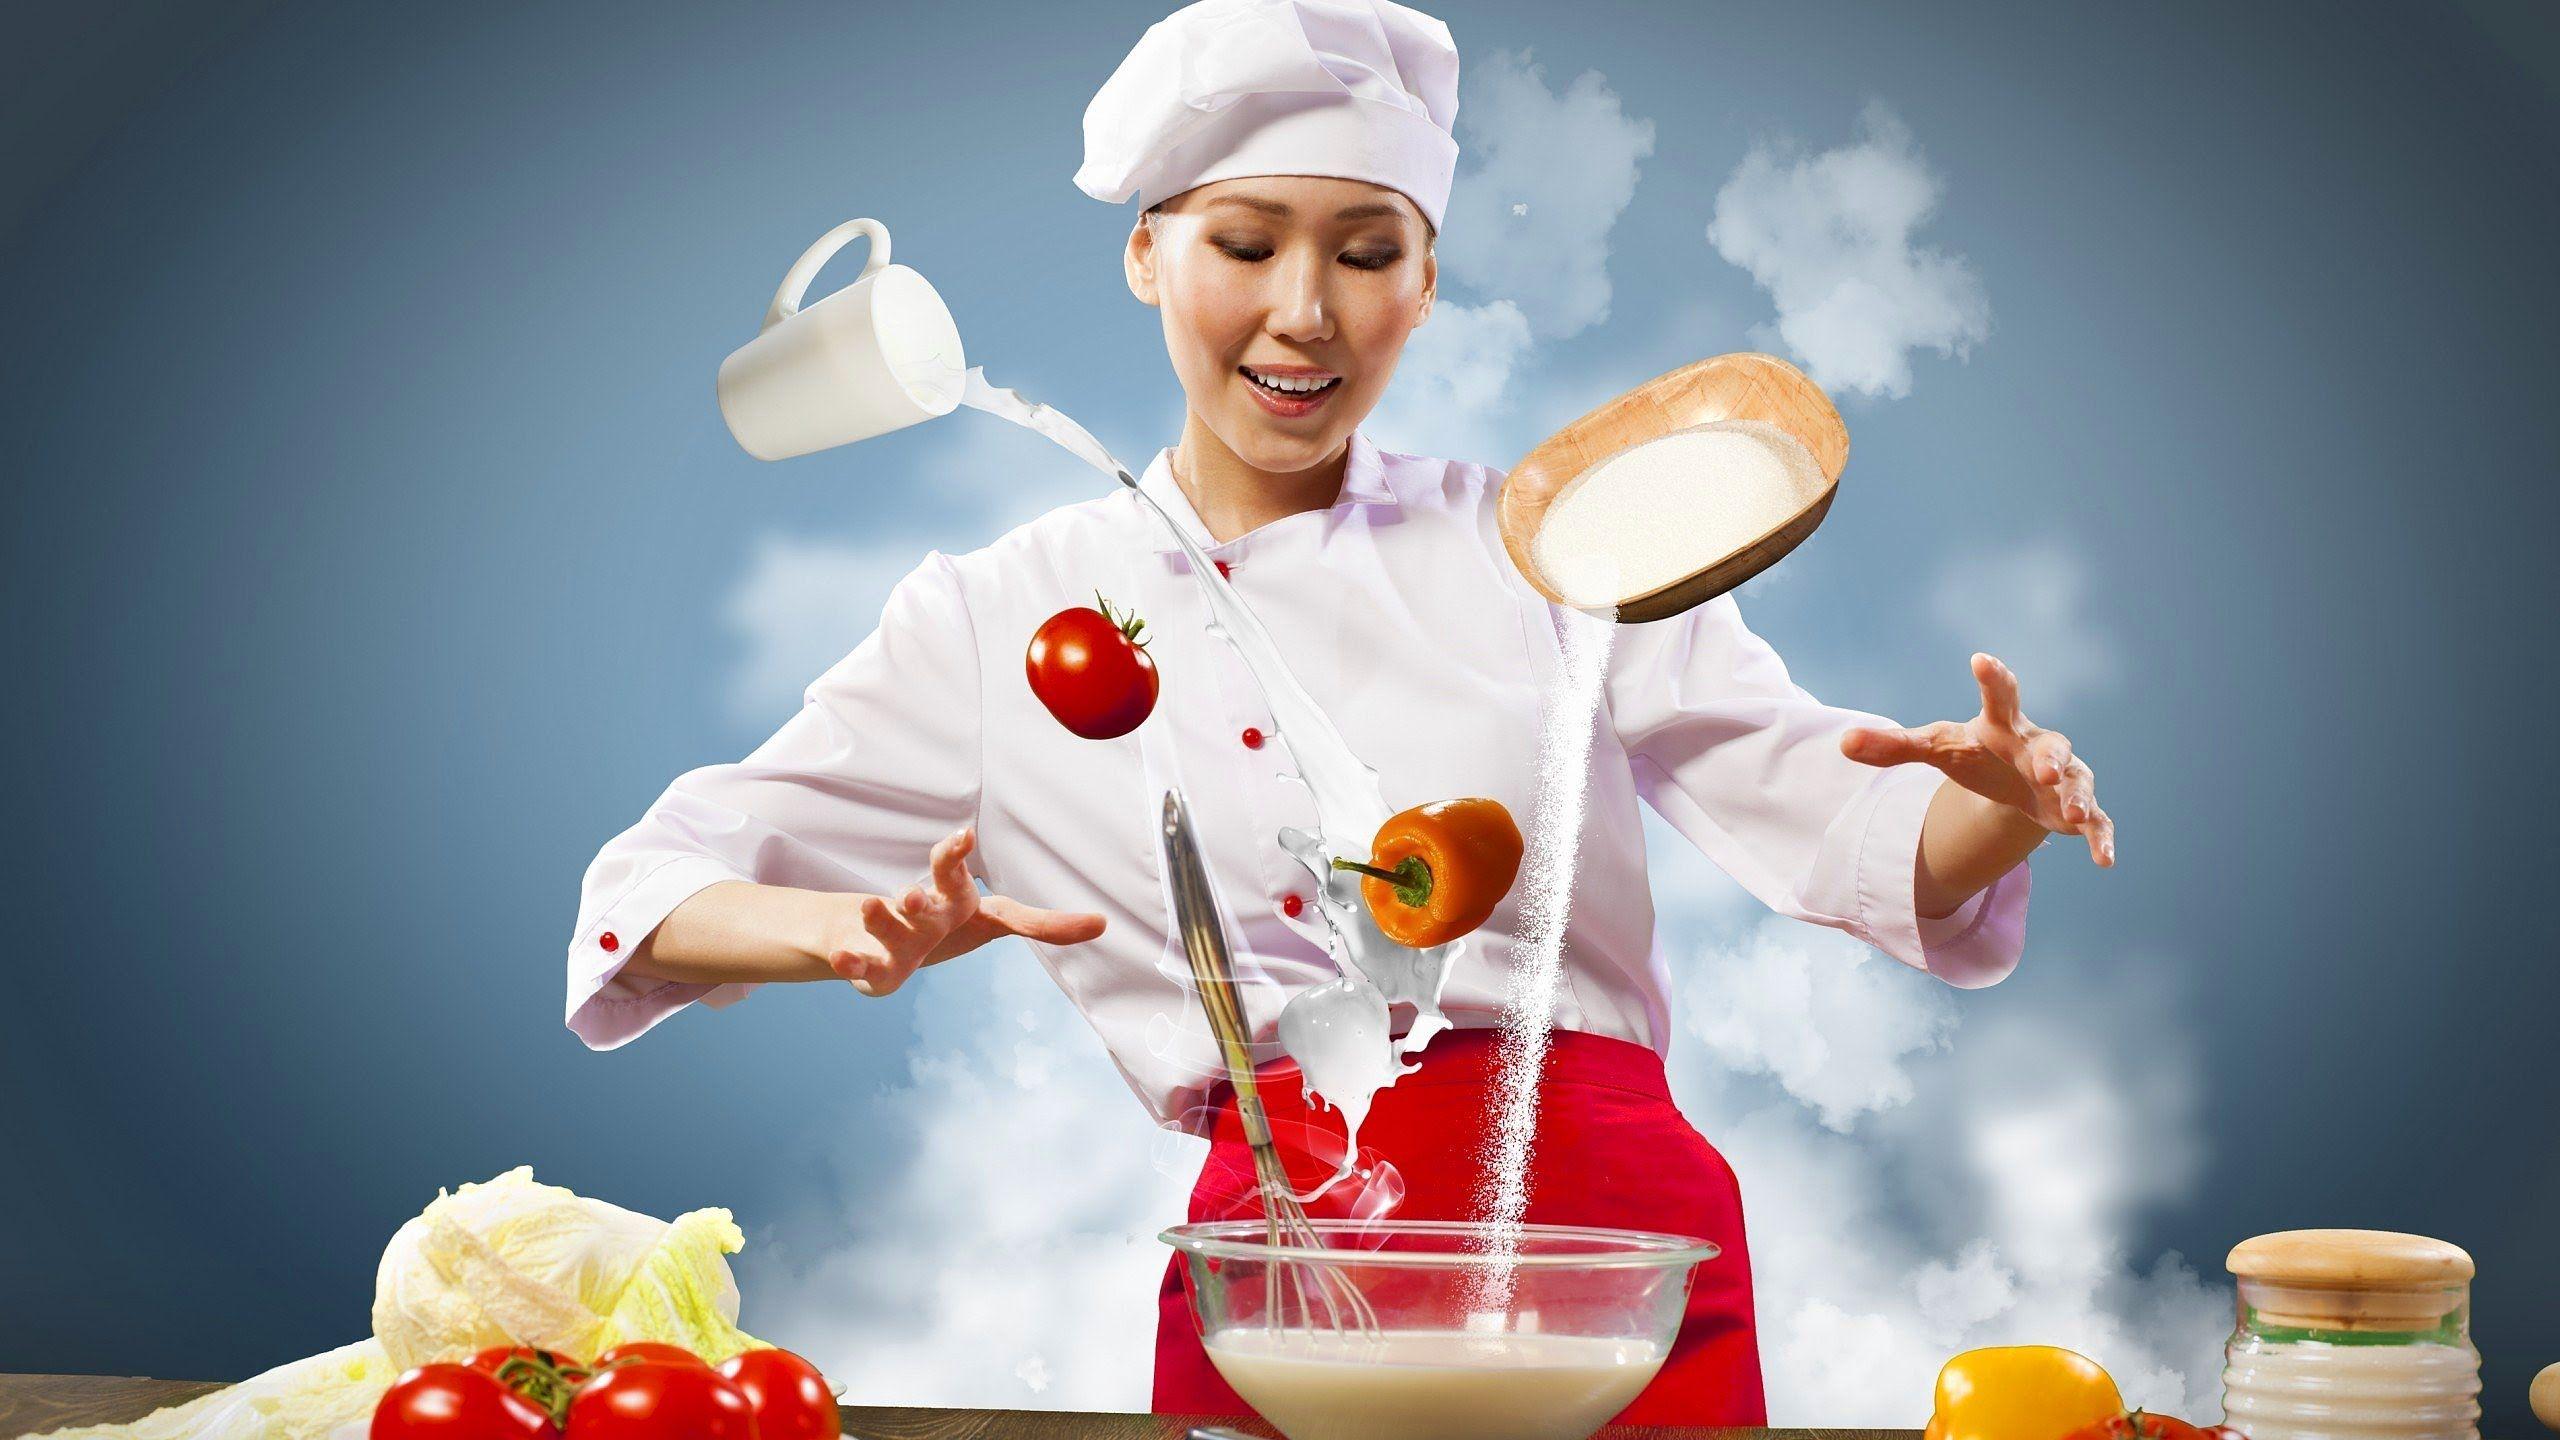 заработок дома - кулинария